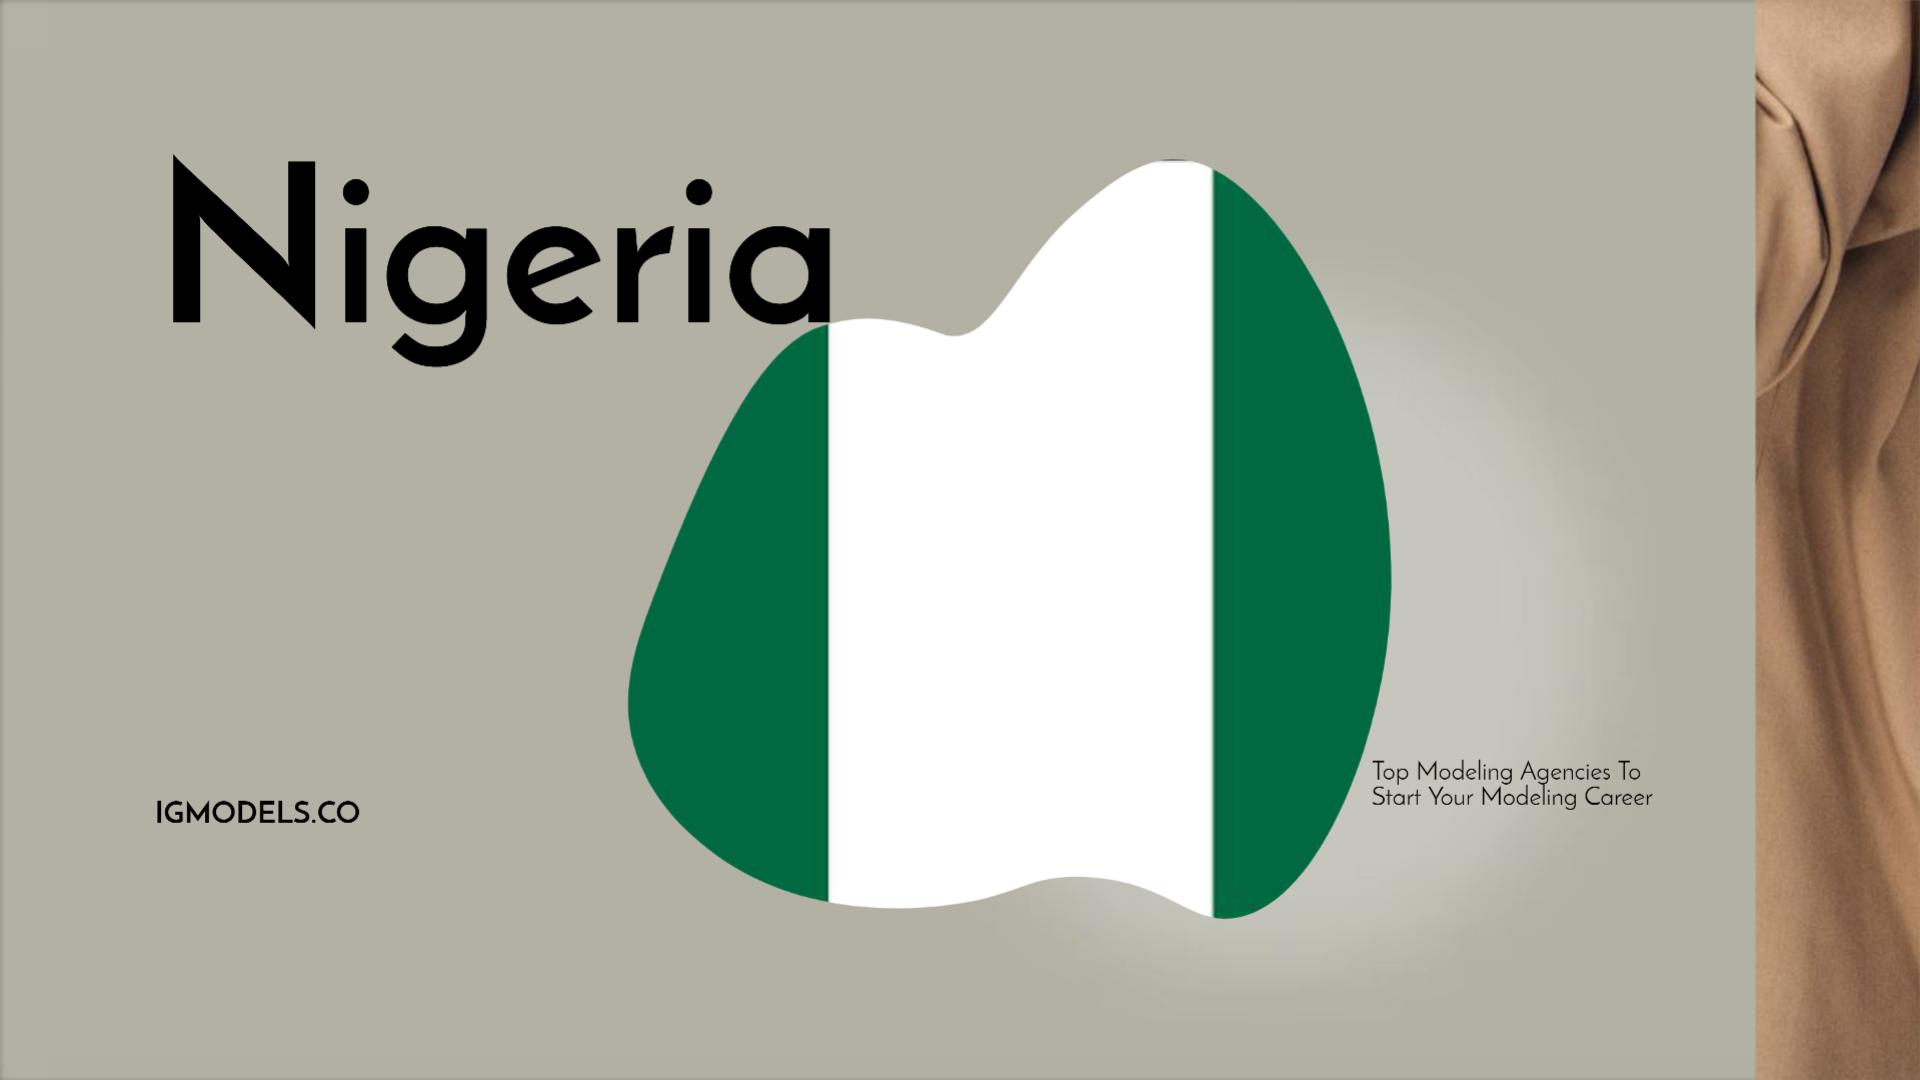 List : Top 35 Modeling Agencies In Nigeria To Start Your Modeling Career In 2021